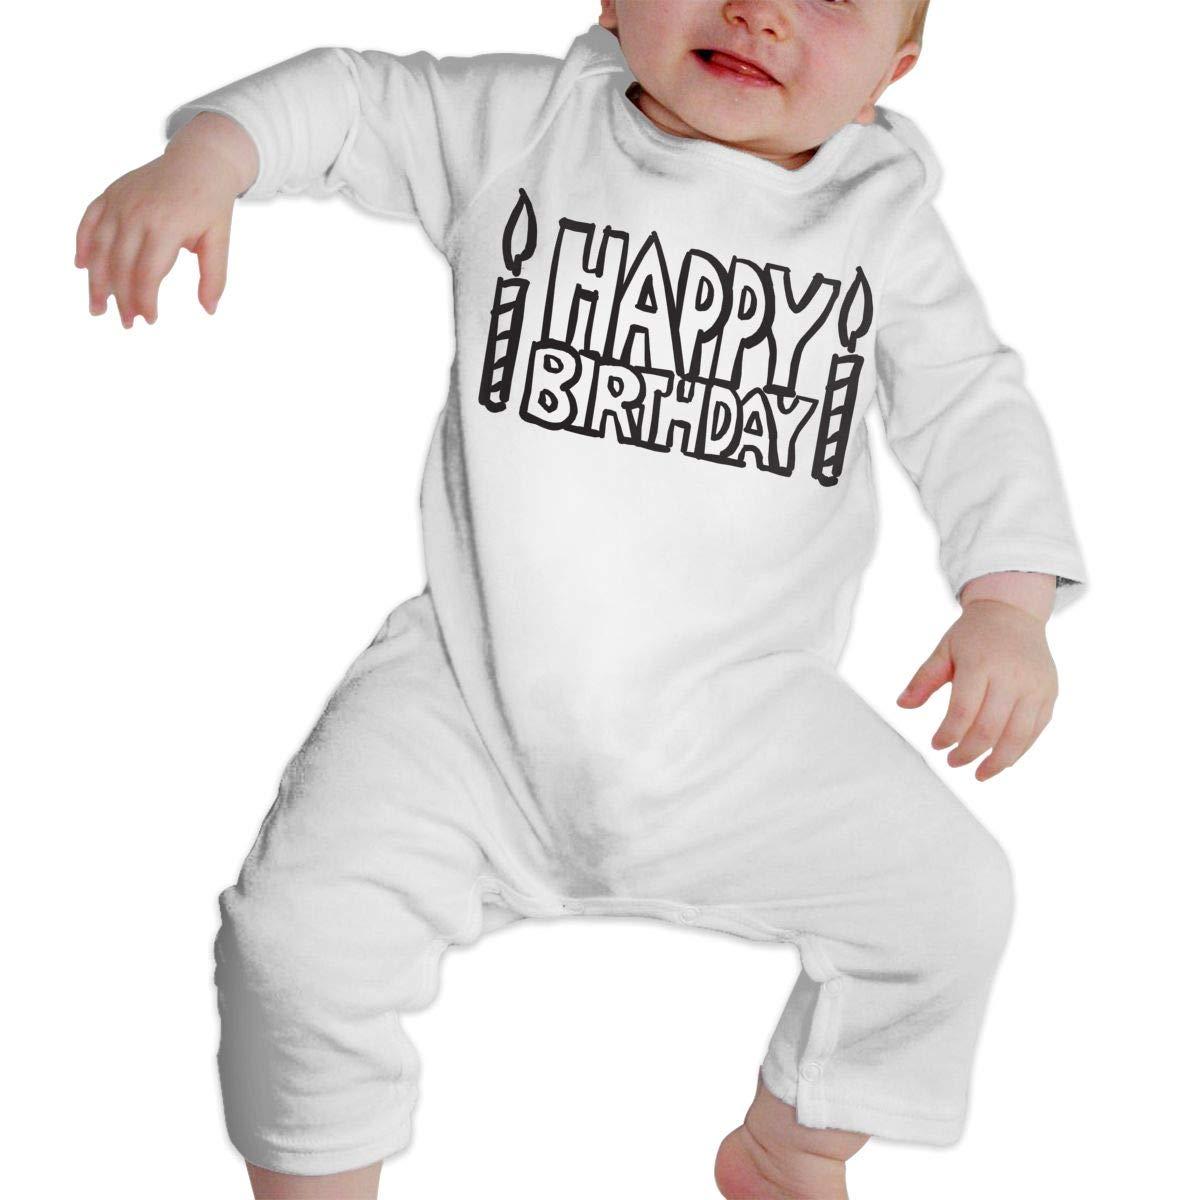 nordic runes Happy Birthday Baby Onesies Toddler Baby Girl//Boy Unisex Clothes Romper Jumpsuit Bodysuit One Piece